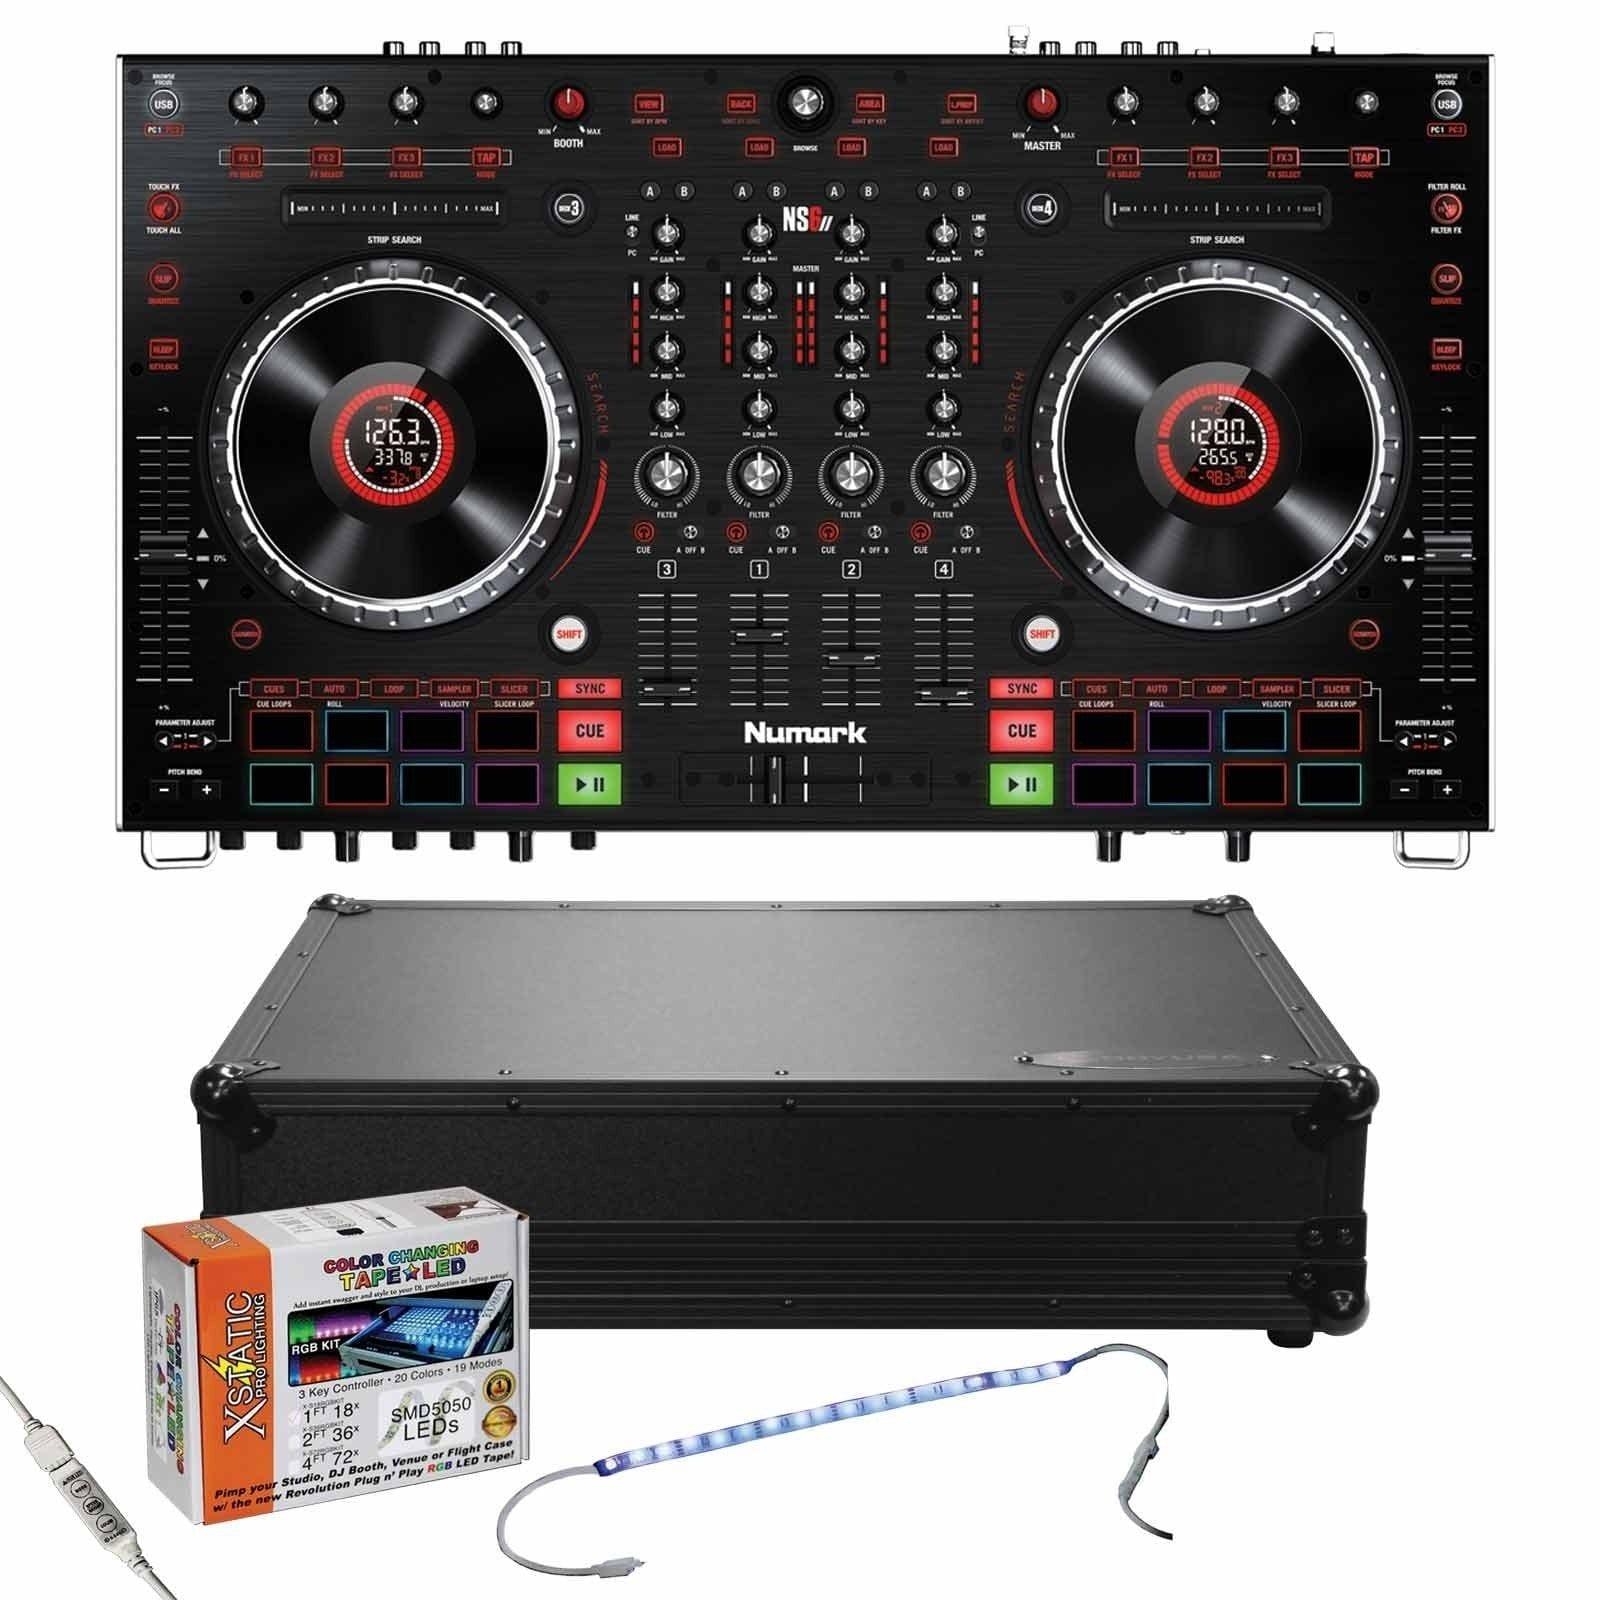 numark-ns6ii-4-channel-premium-dj-controller-black-glide-style-odyssey-case-package-b63